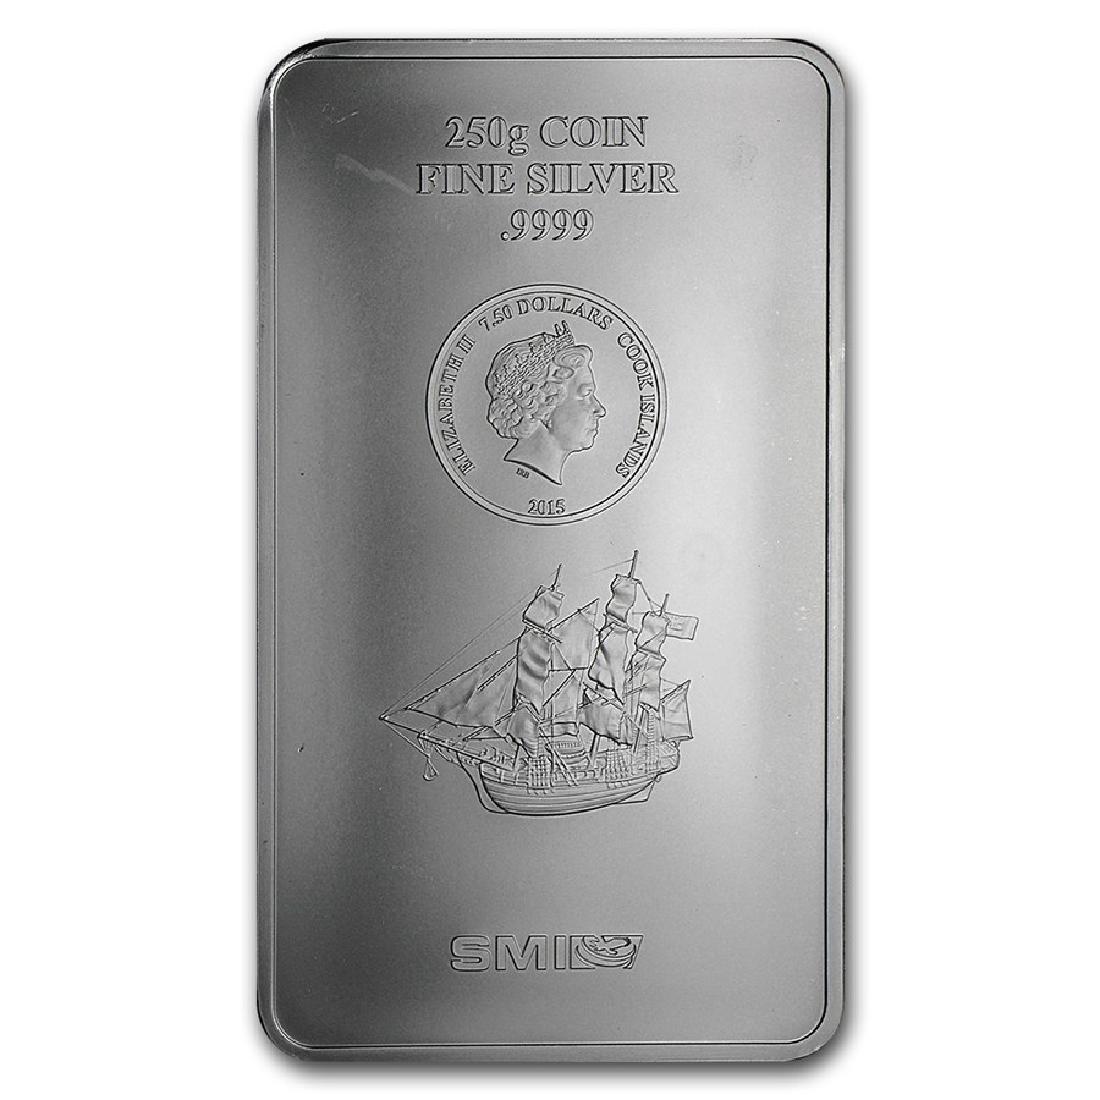 Genuine 250 gram Fine Silver Bar - Cook Islands Bounty